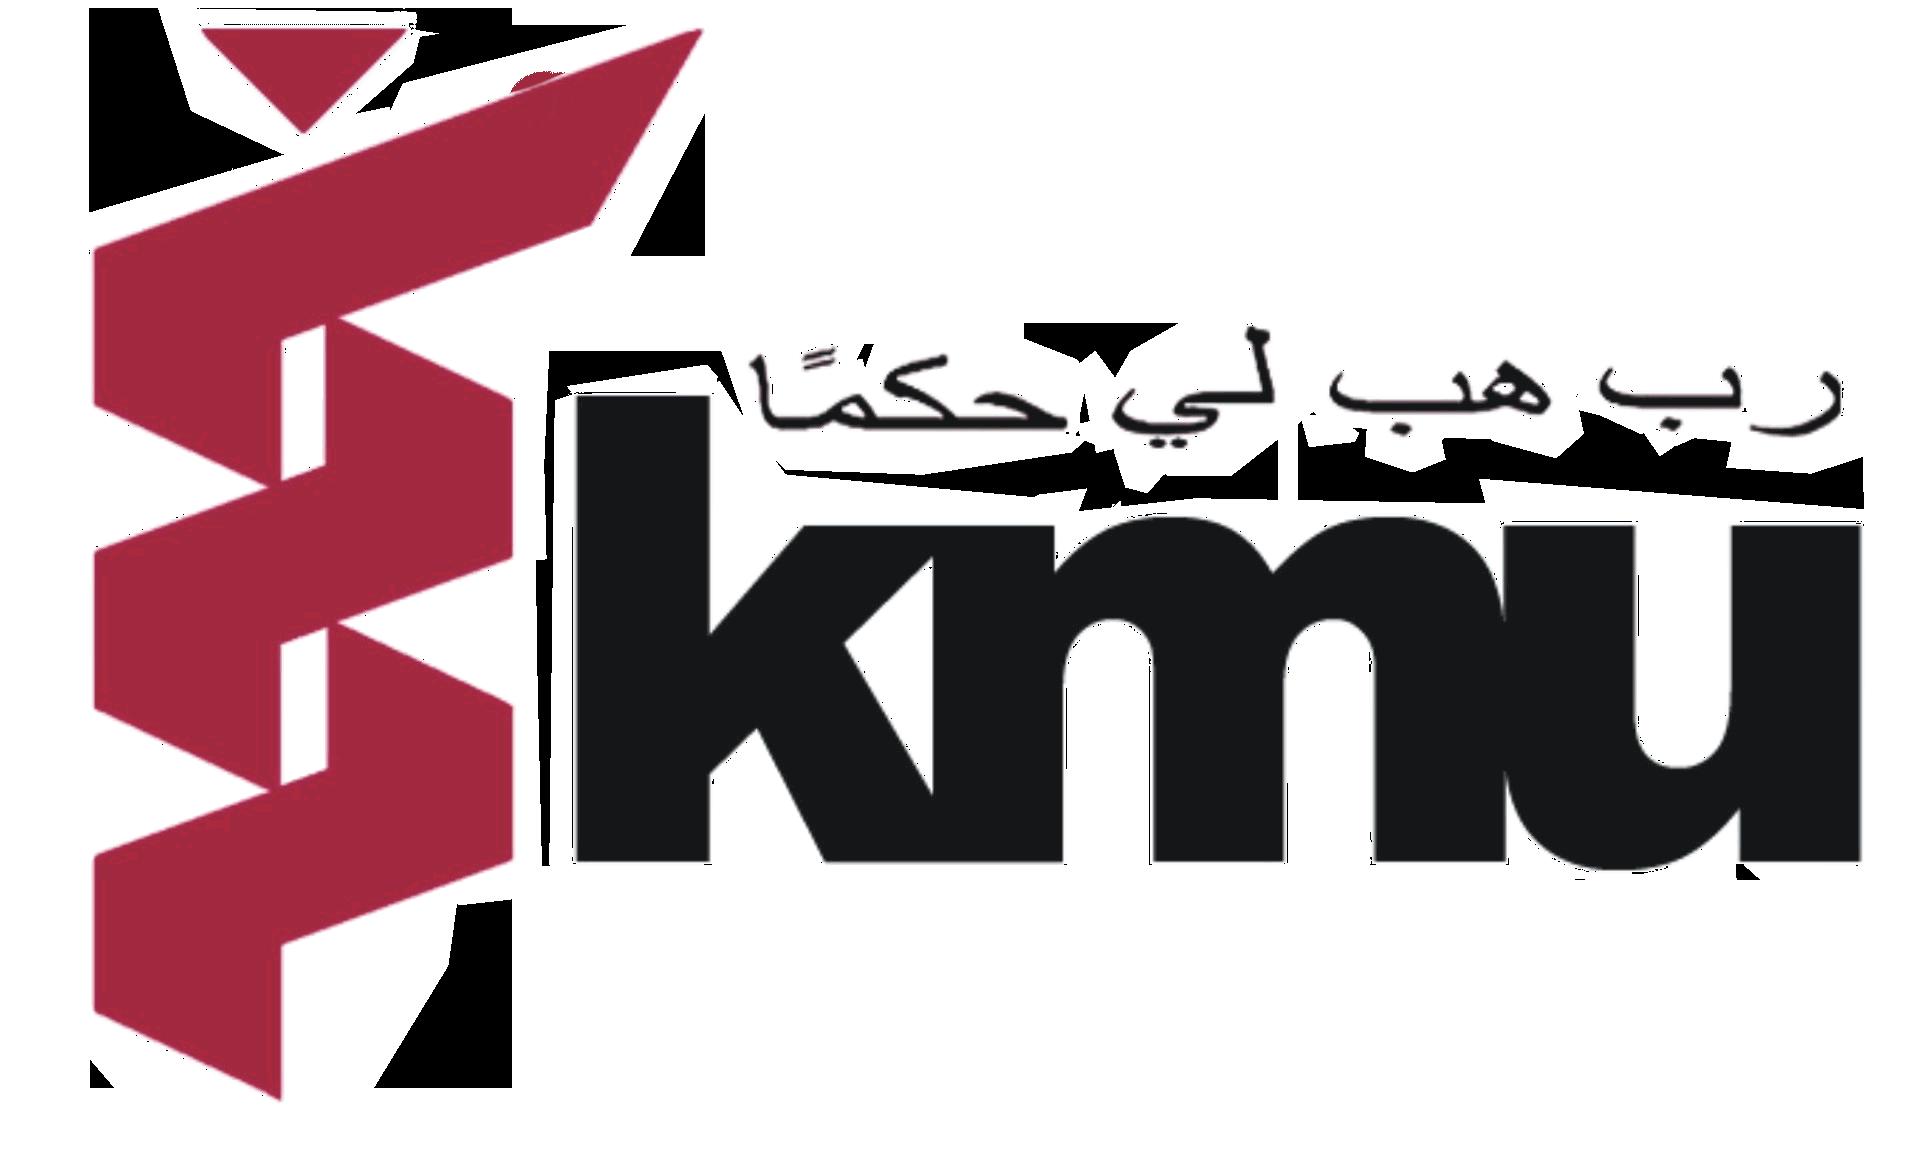 KMU Peshawar Merit List 2017 MBBS, BDS